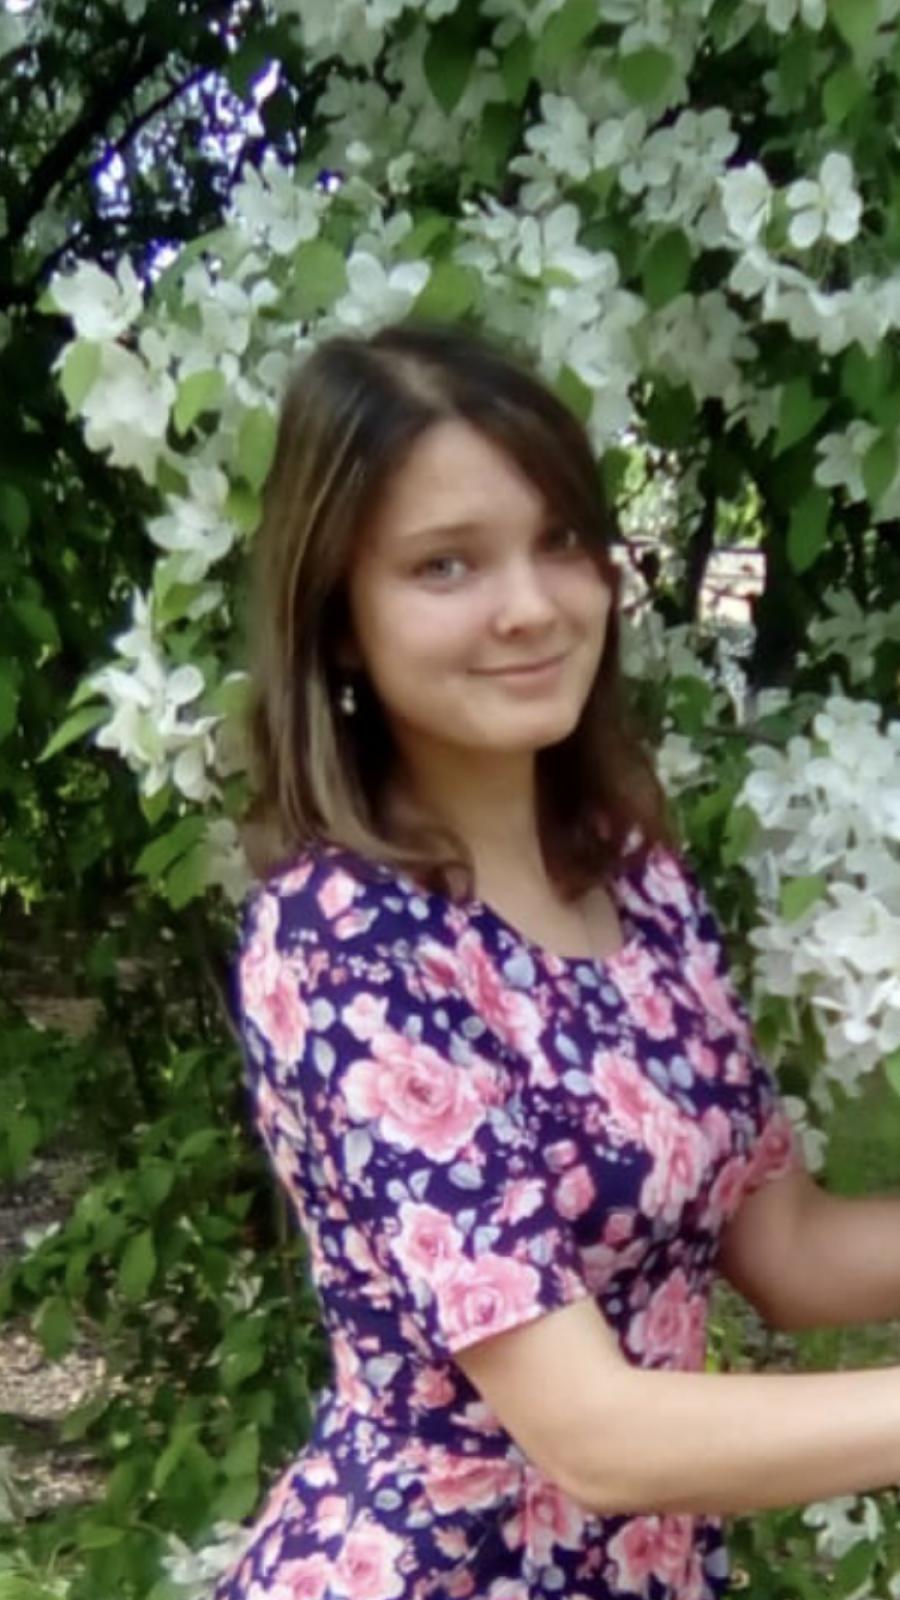 Светлана Кулакова, Кировский дом ребенка.